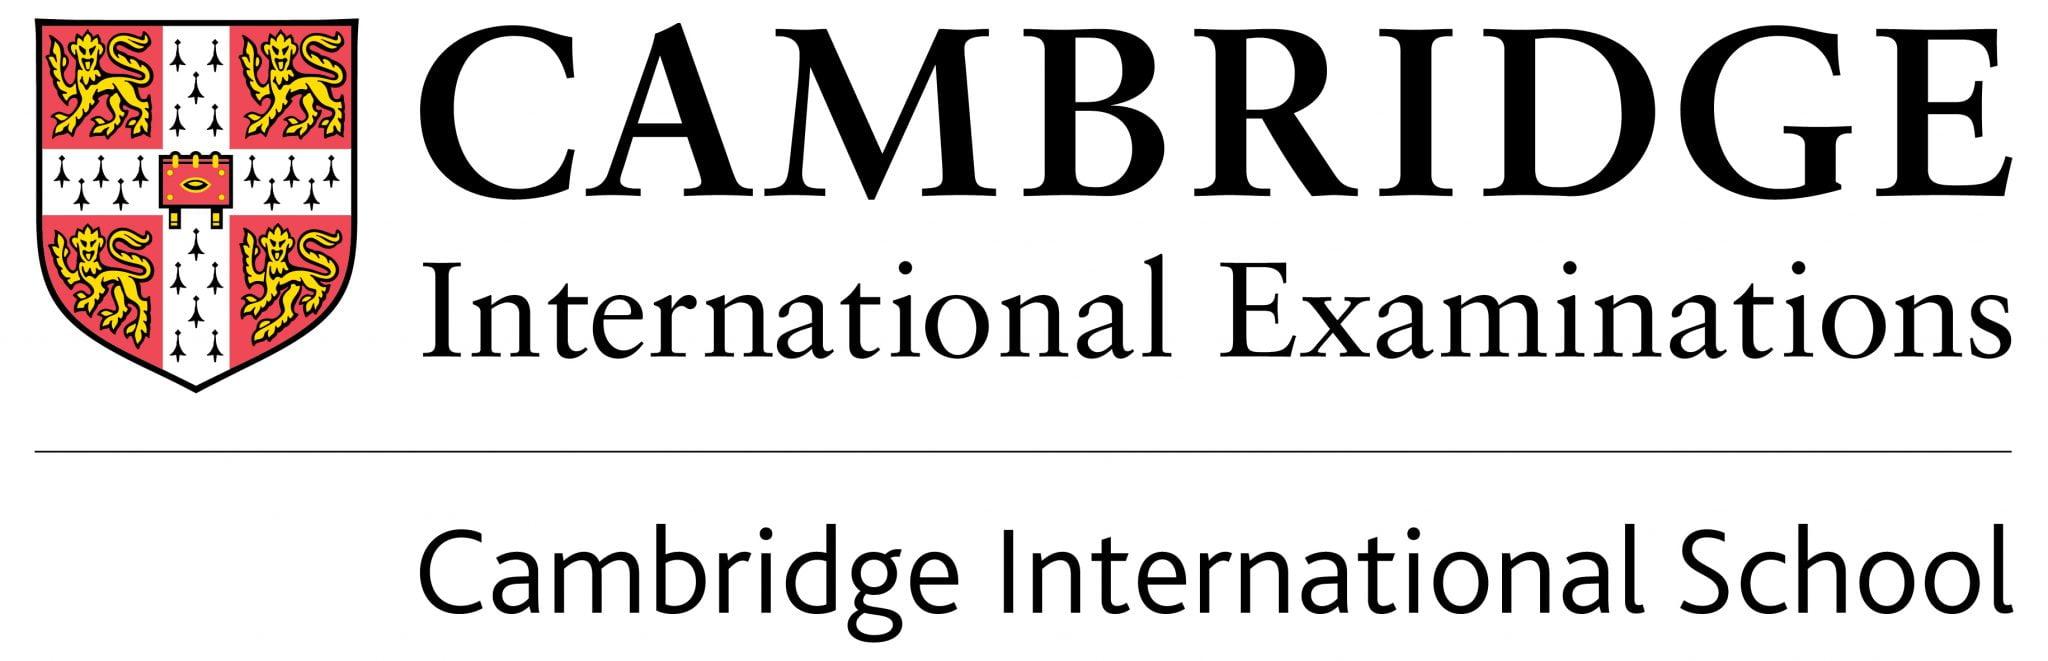 Cambridge International A Level Exam Results announced Today across Dubai, Abu Dhabi, Sharjah, Al Ain Fujeirah, UAE